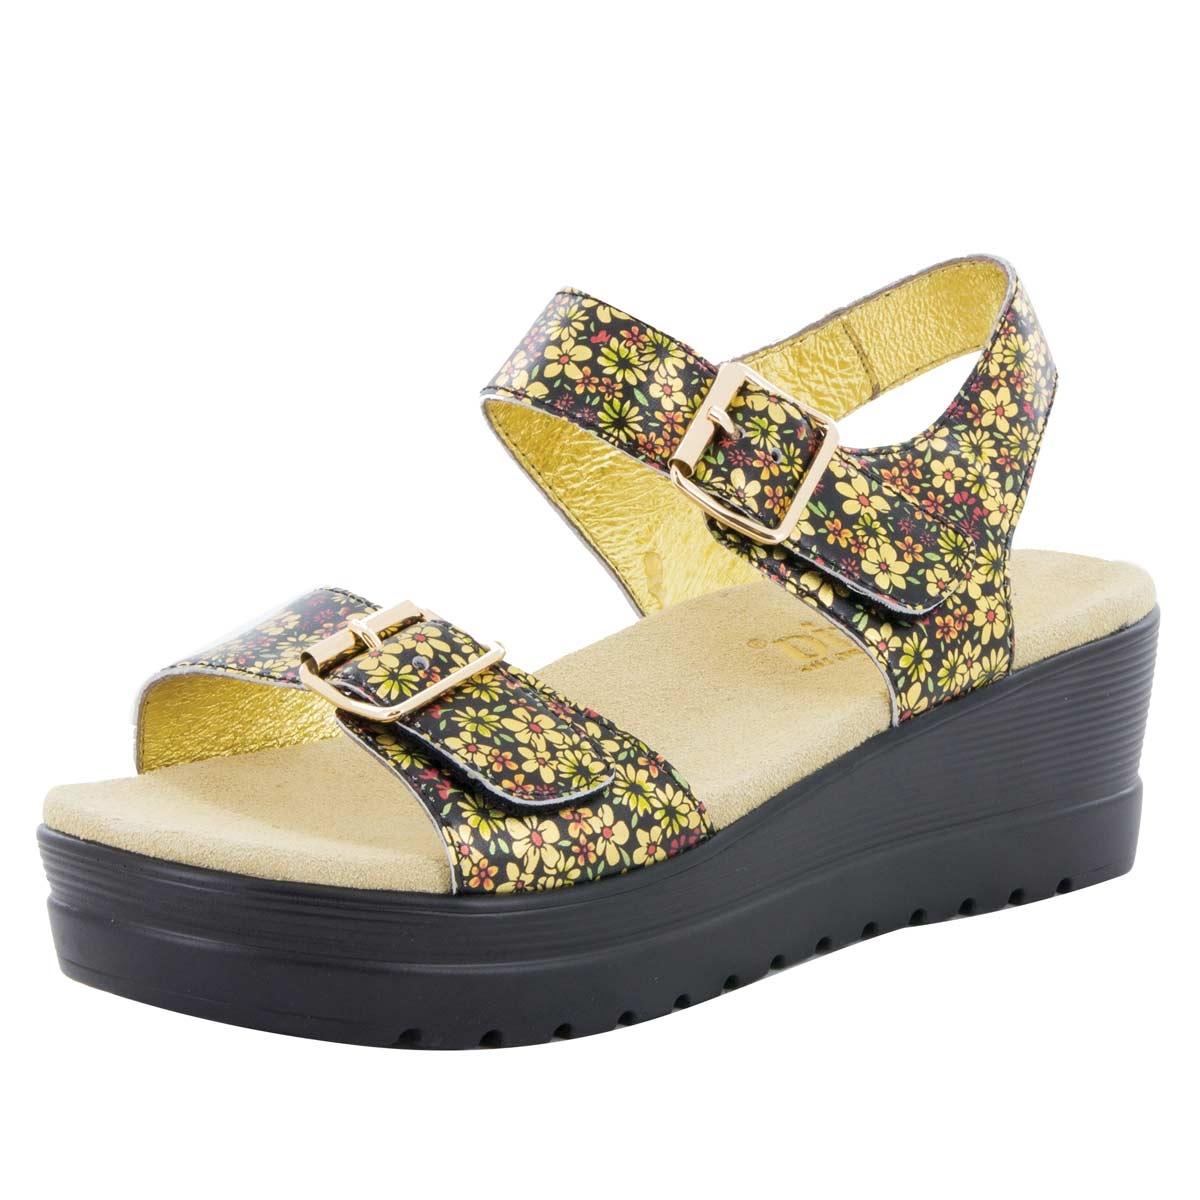 e2b7aa15305 Morgyn Pretty Things Sandal - Alegria Shoes